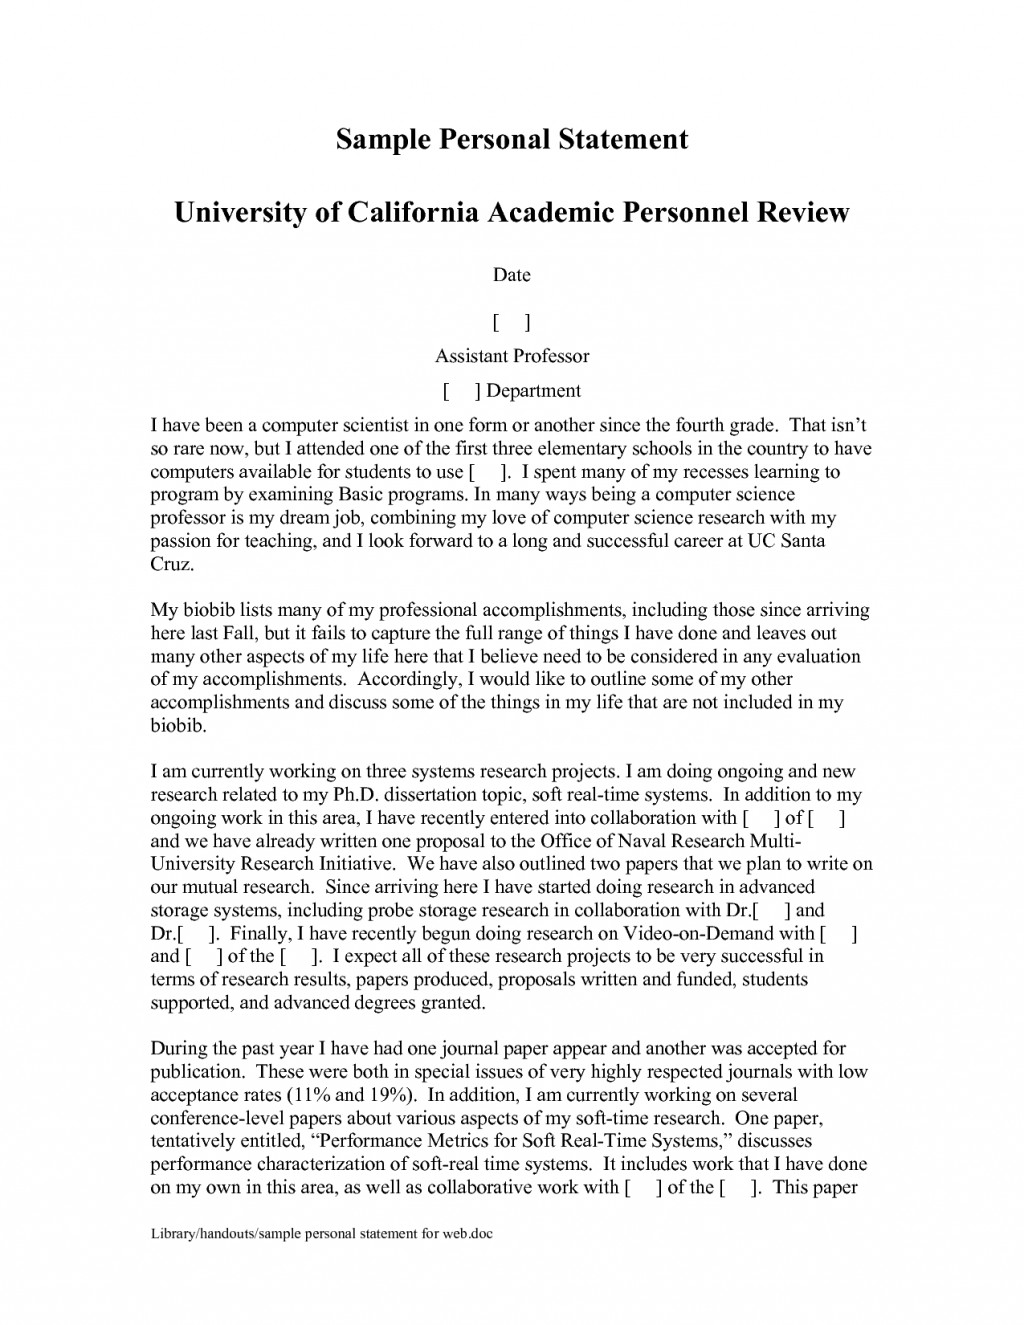 002 Essay Example Diversity Graduate Personal Statement Template Remarkable Uw Sample Law School Large